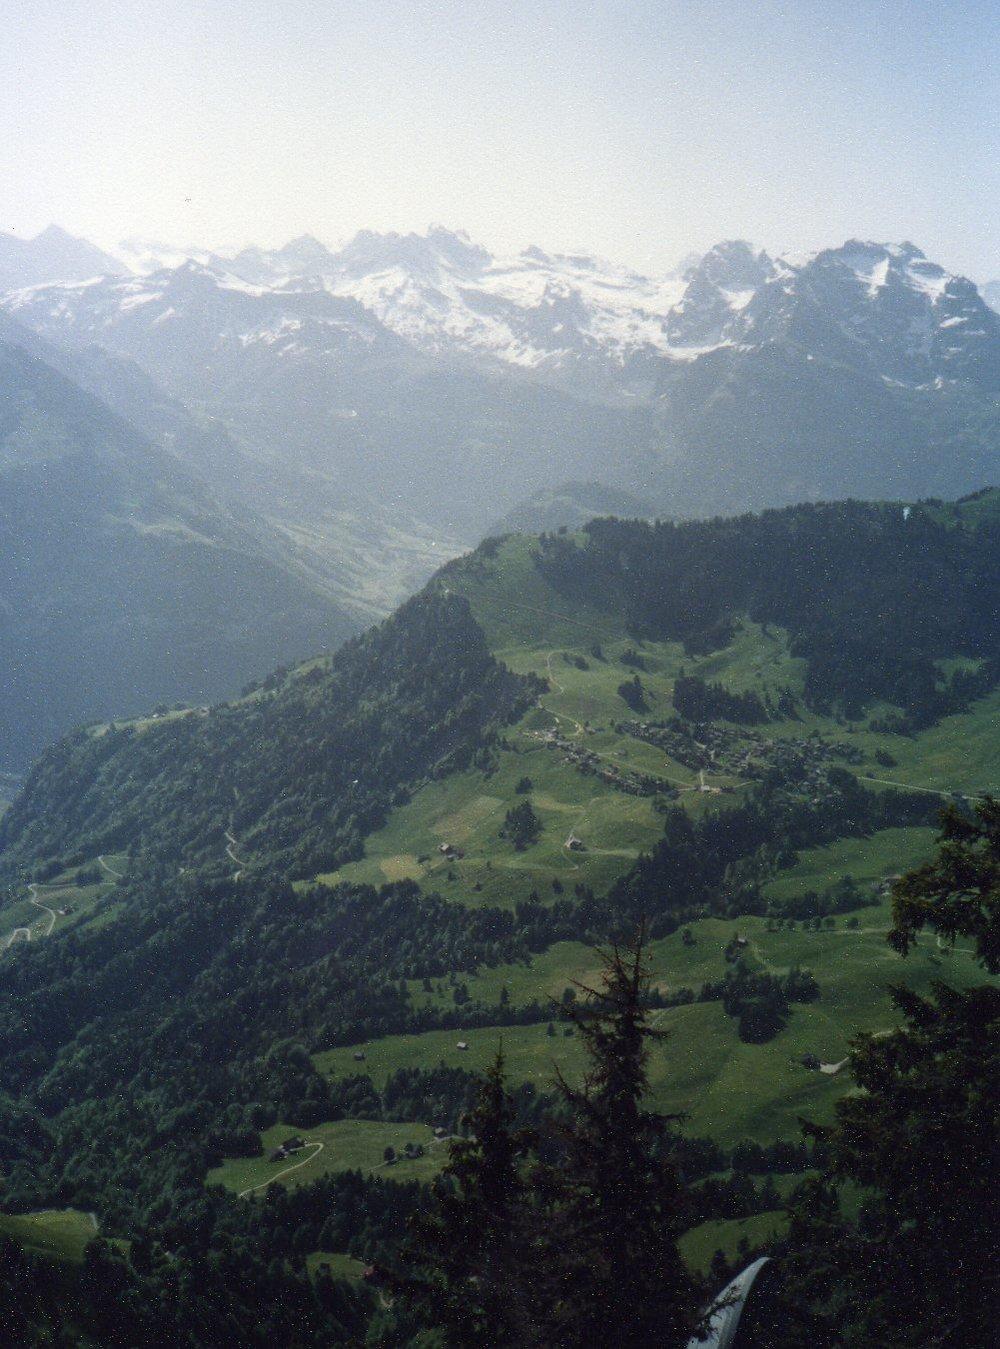 Spectacular scenery -